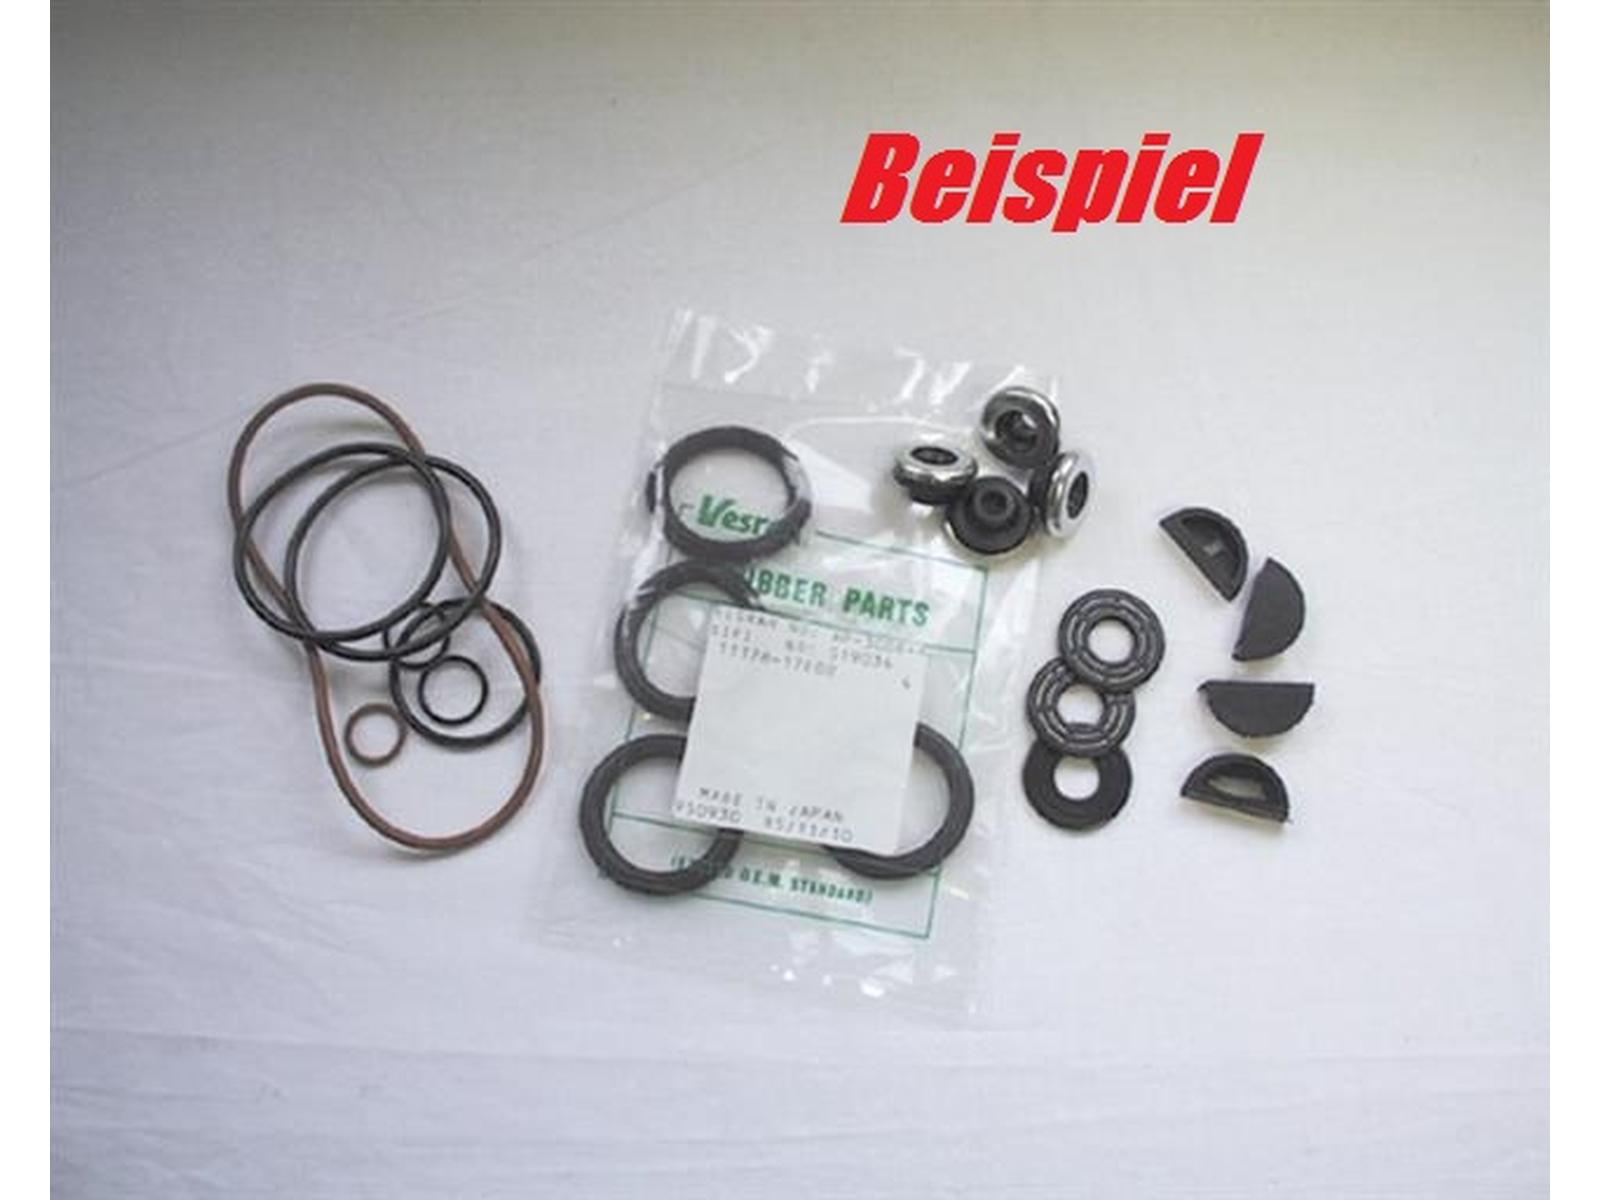 Ventildeckeldichtung Kawasaki Klx 650 R